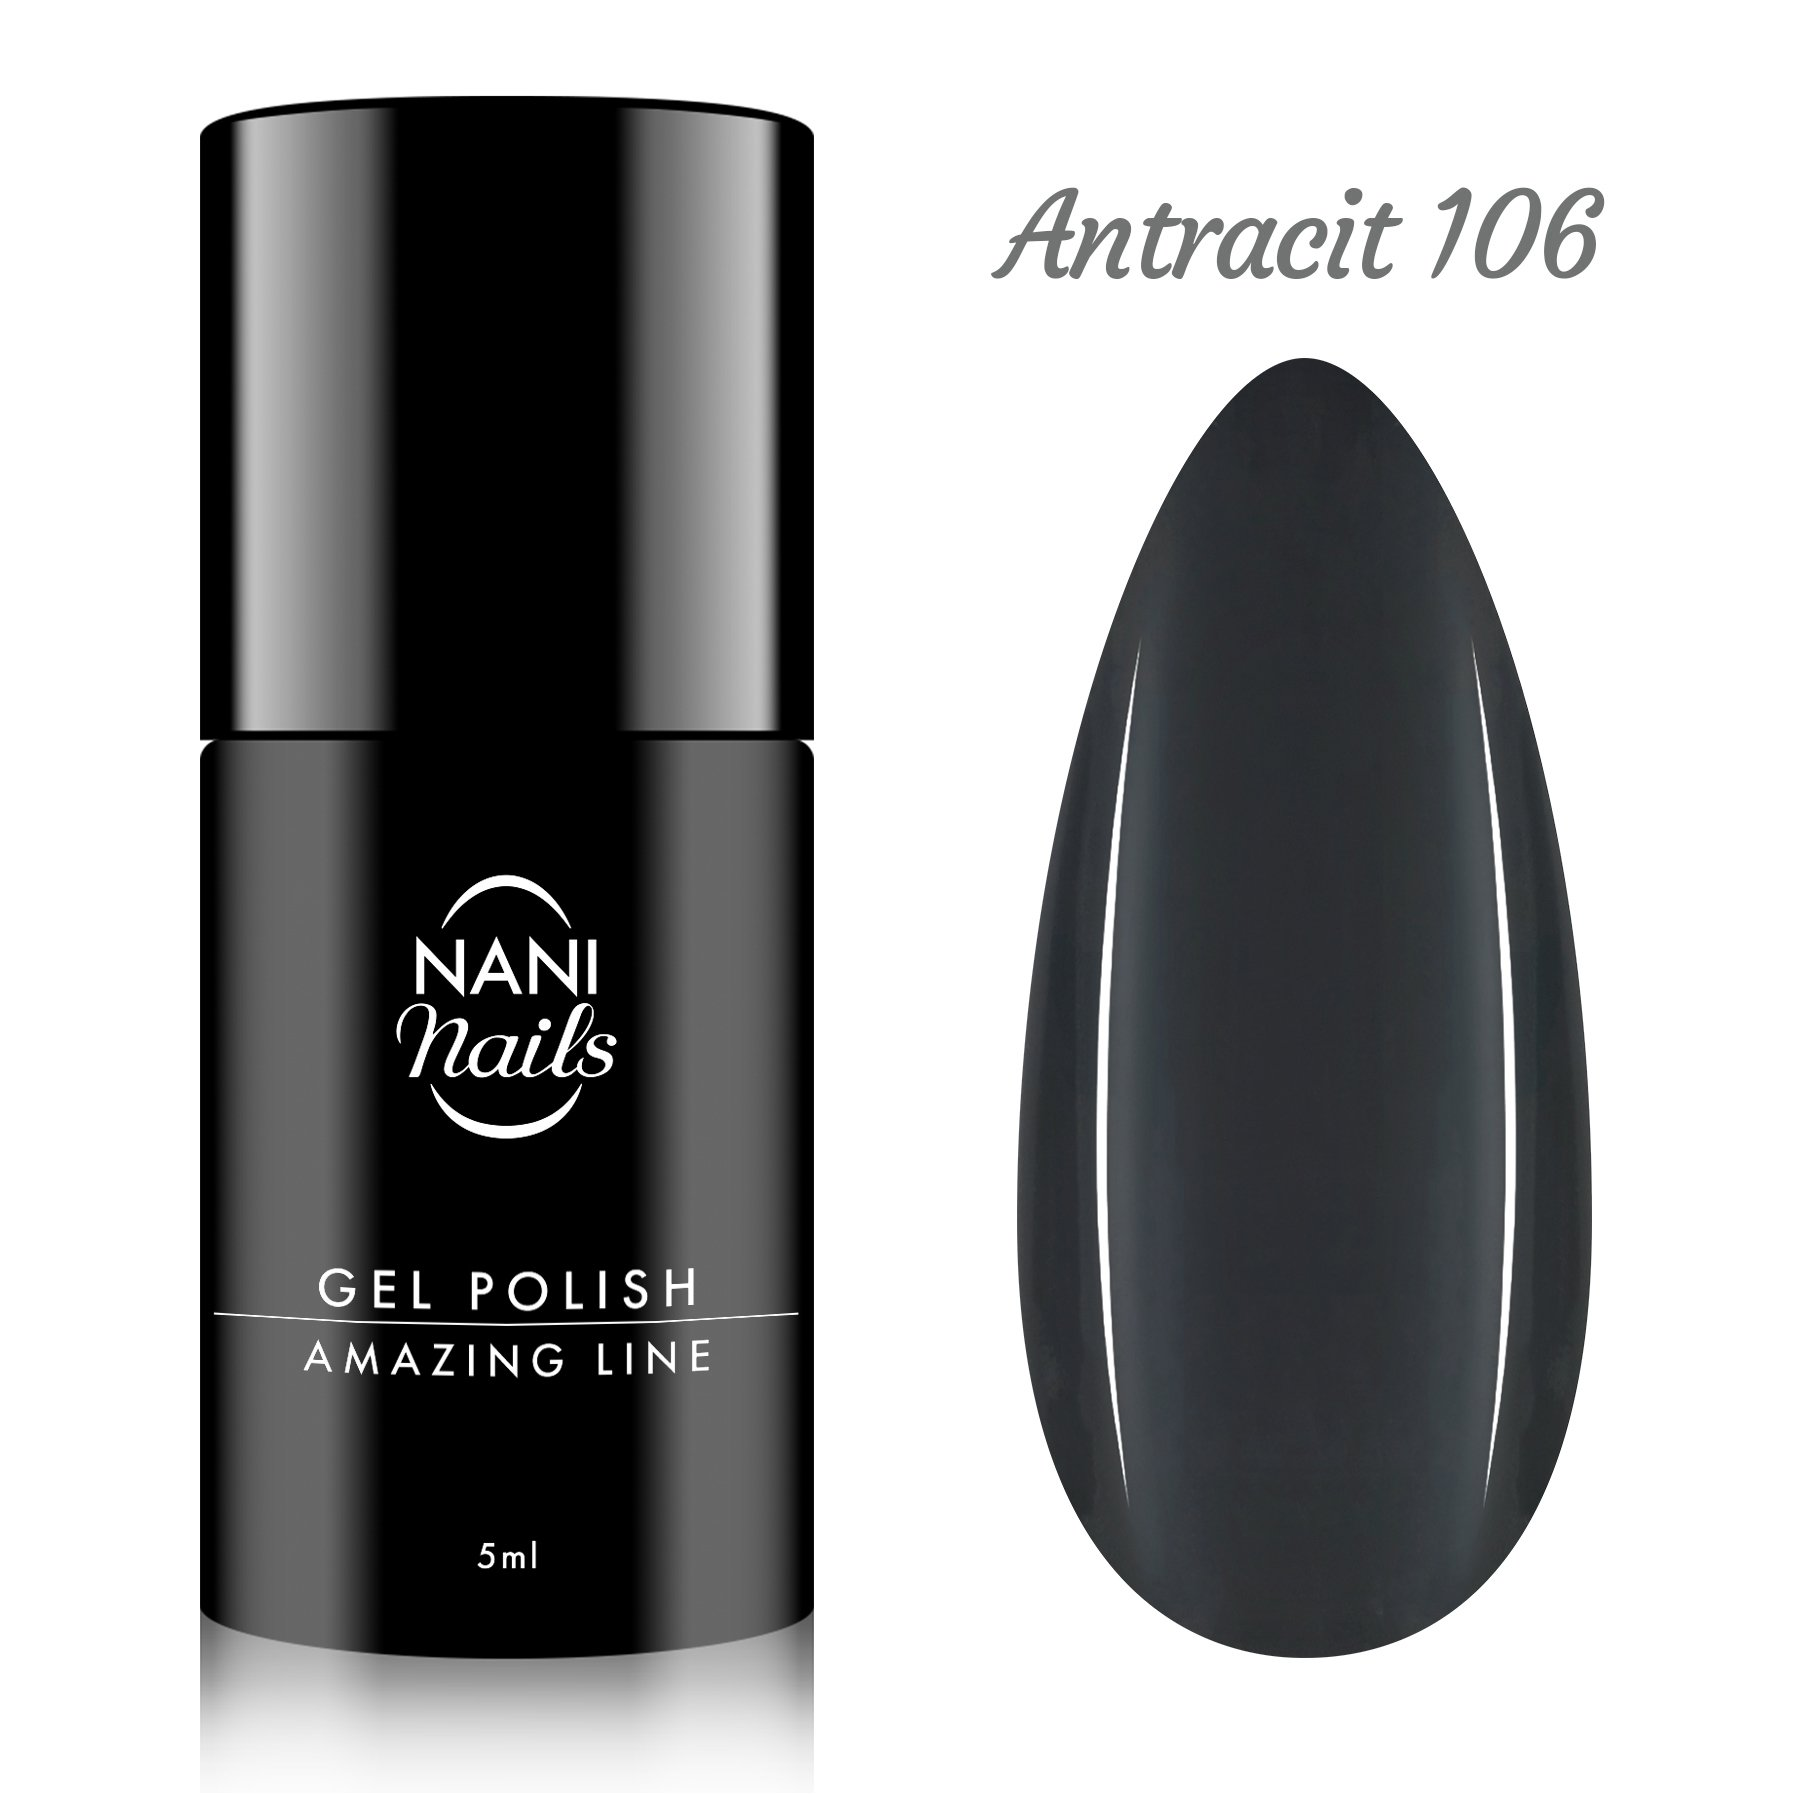 NANI gel lak Amazing Line 5 ml - Antracit